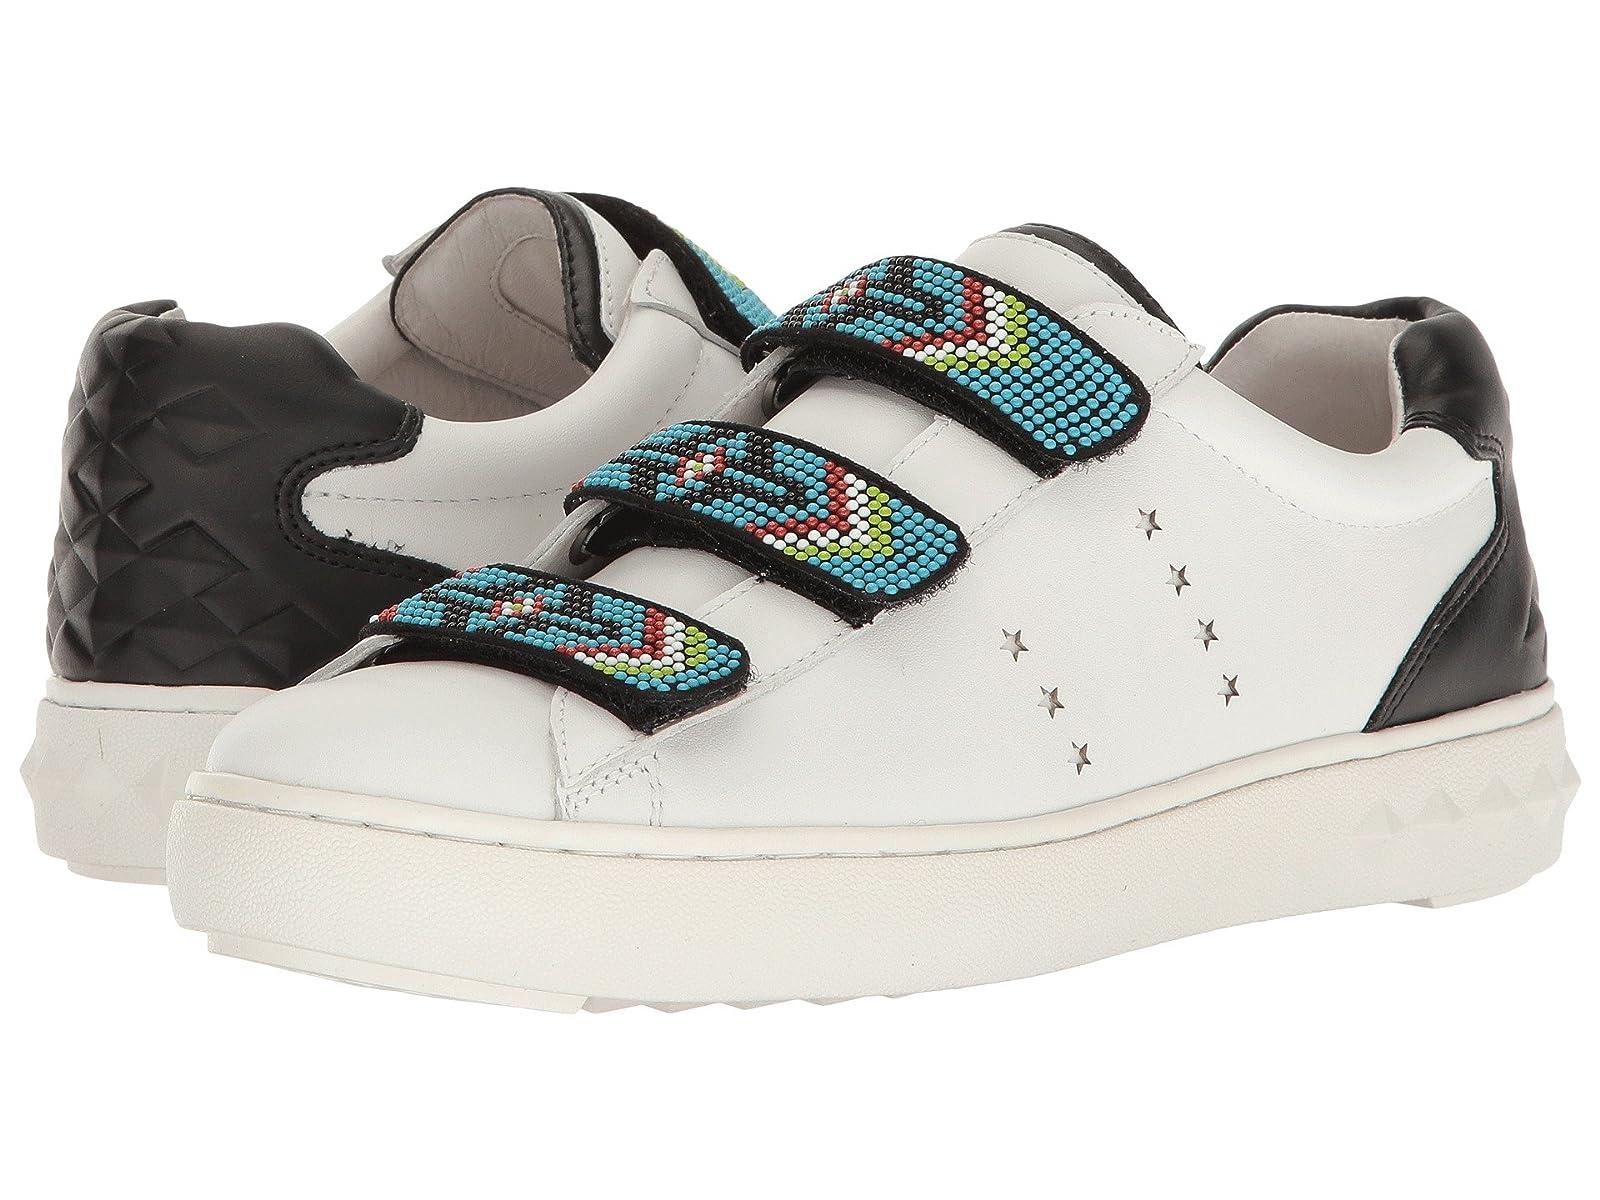 ASH PharellCheap and distinctive eye-catching shoes